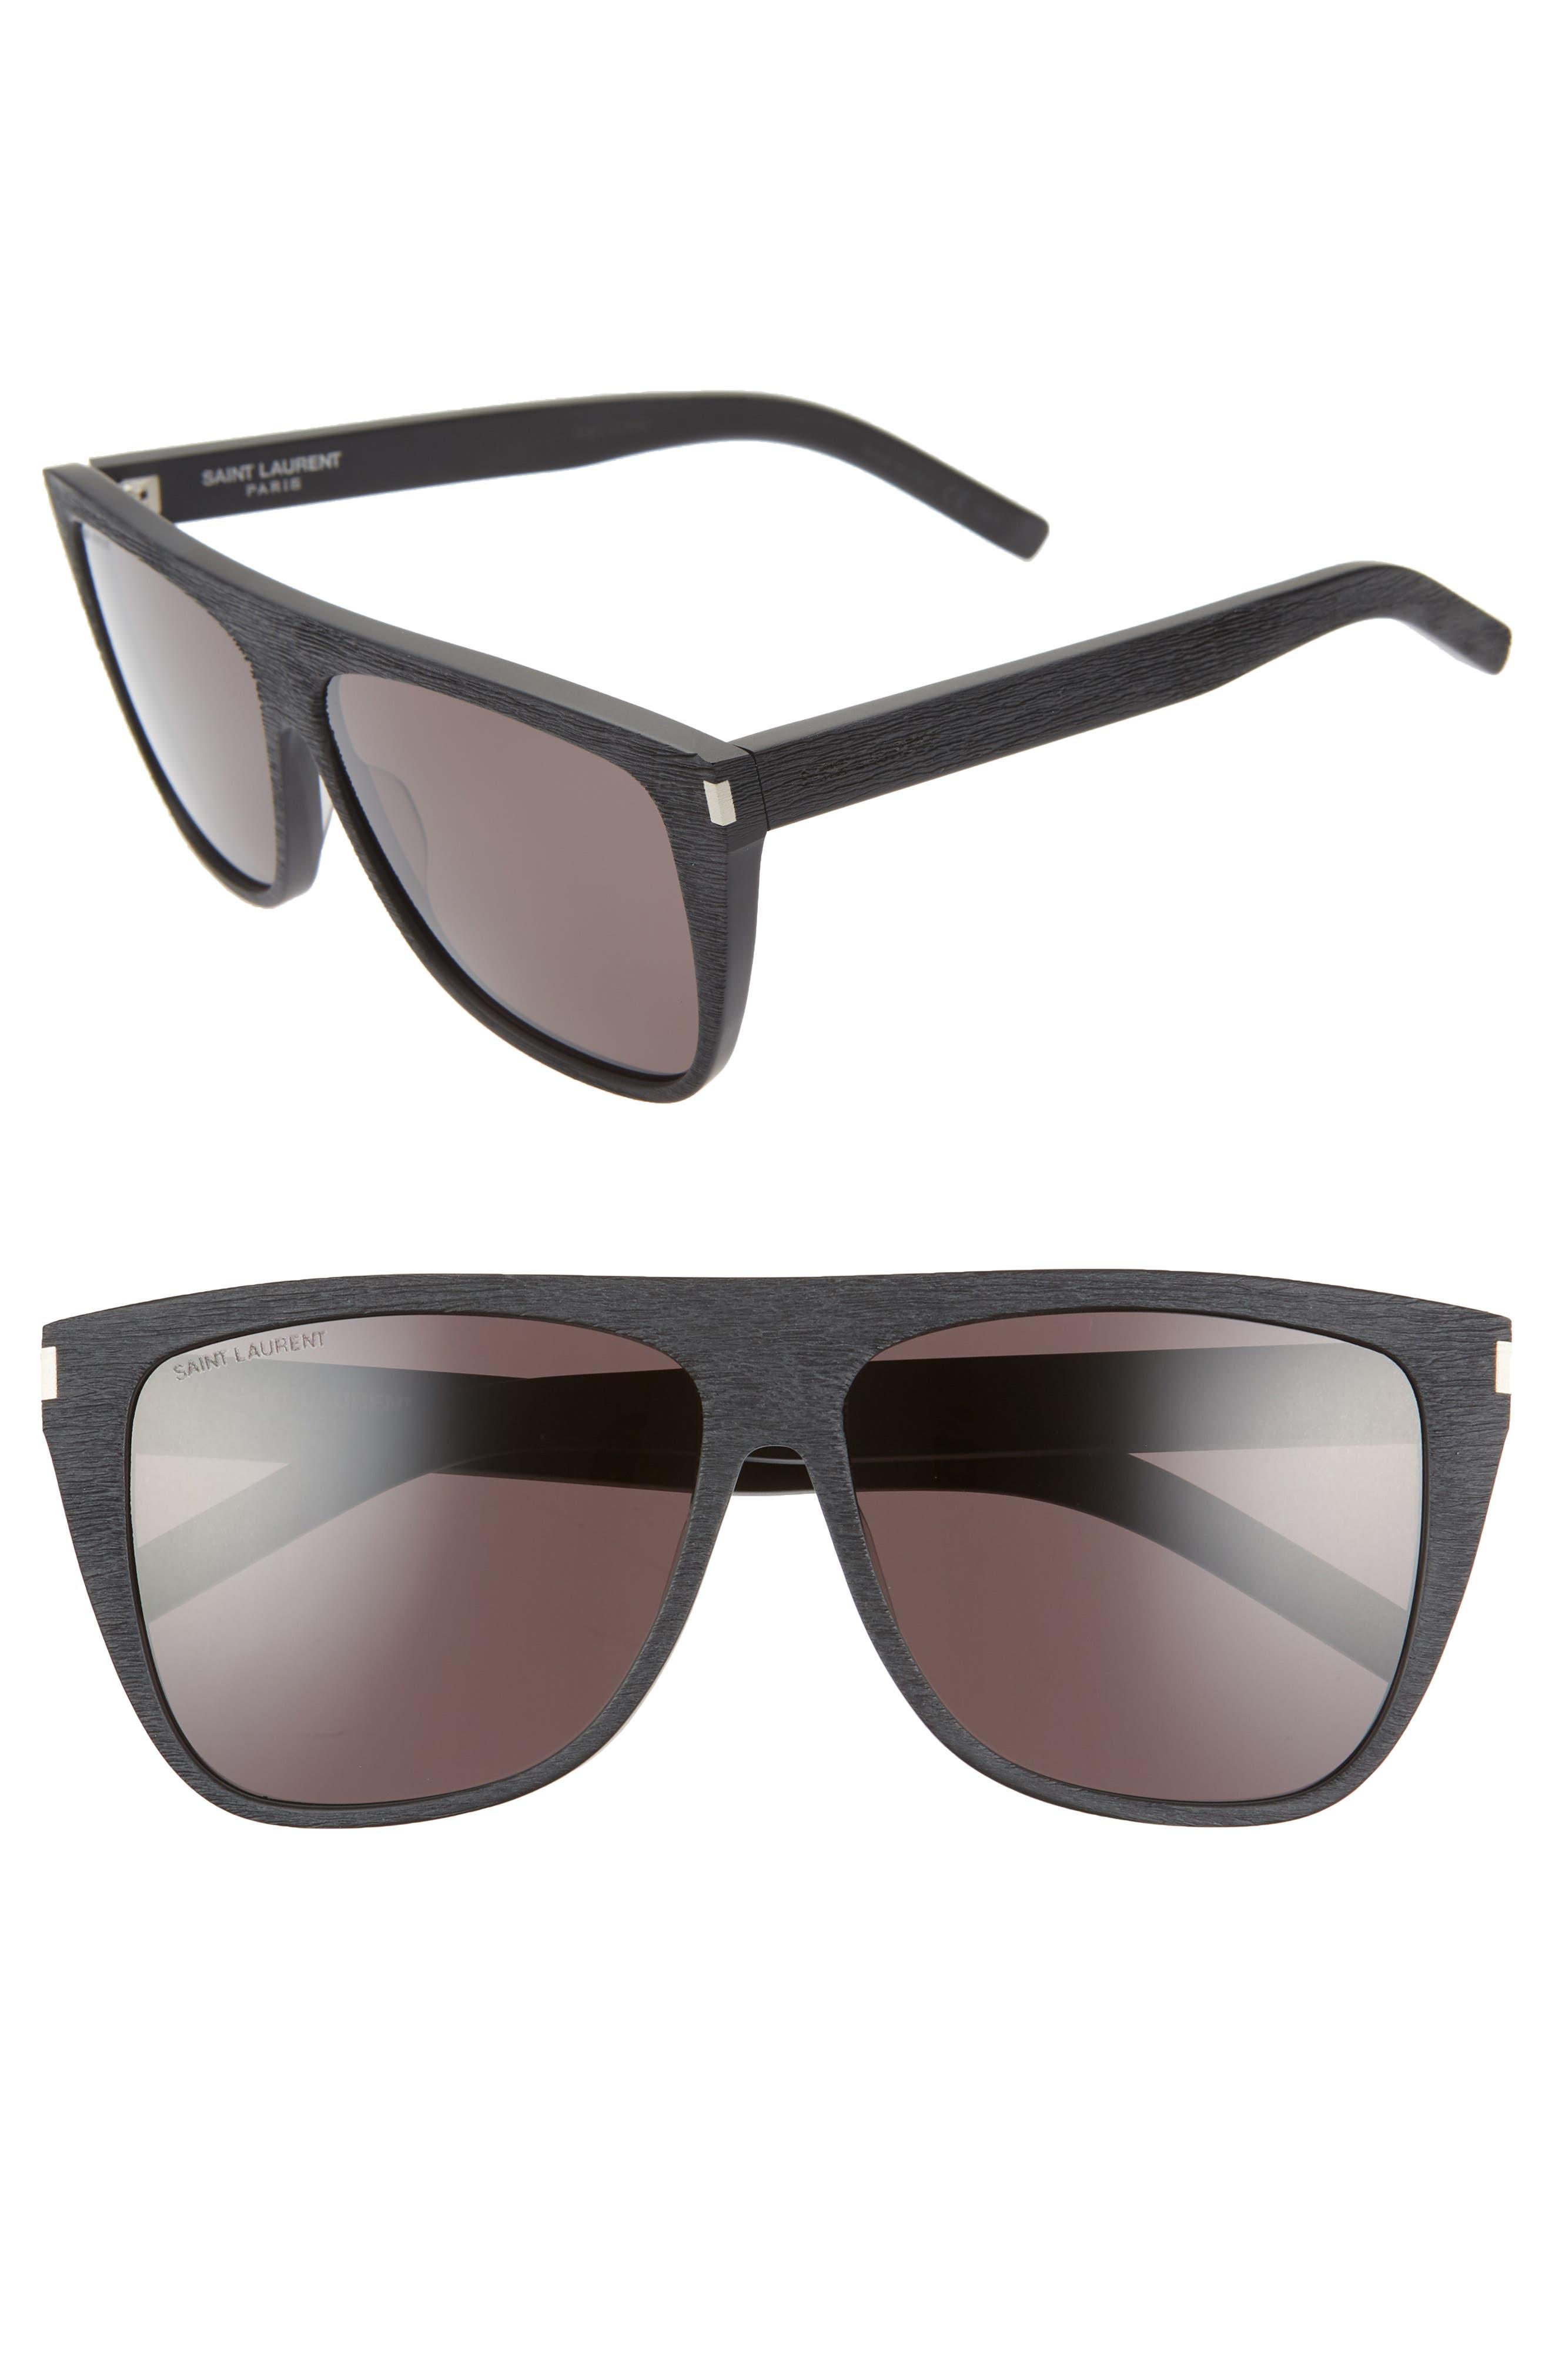 SAINT LAURENT, 59mm Sunglasses, Main thumbnail 1, color, WOOD EFFECT BLACK/ GREY SOLID